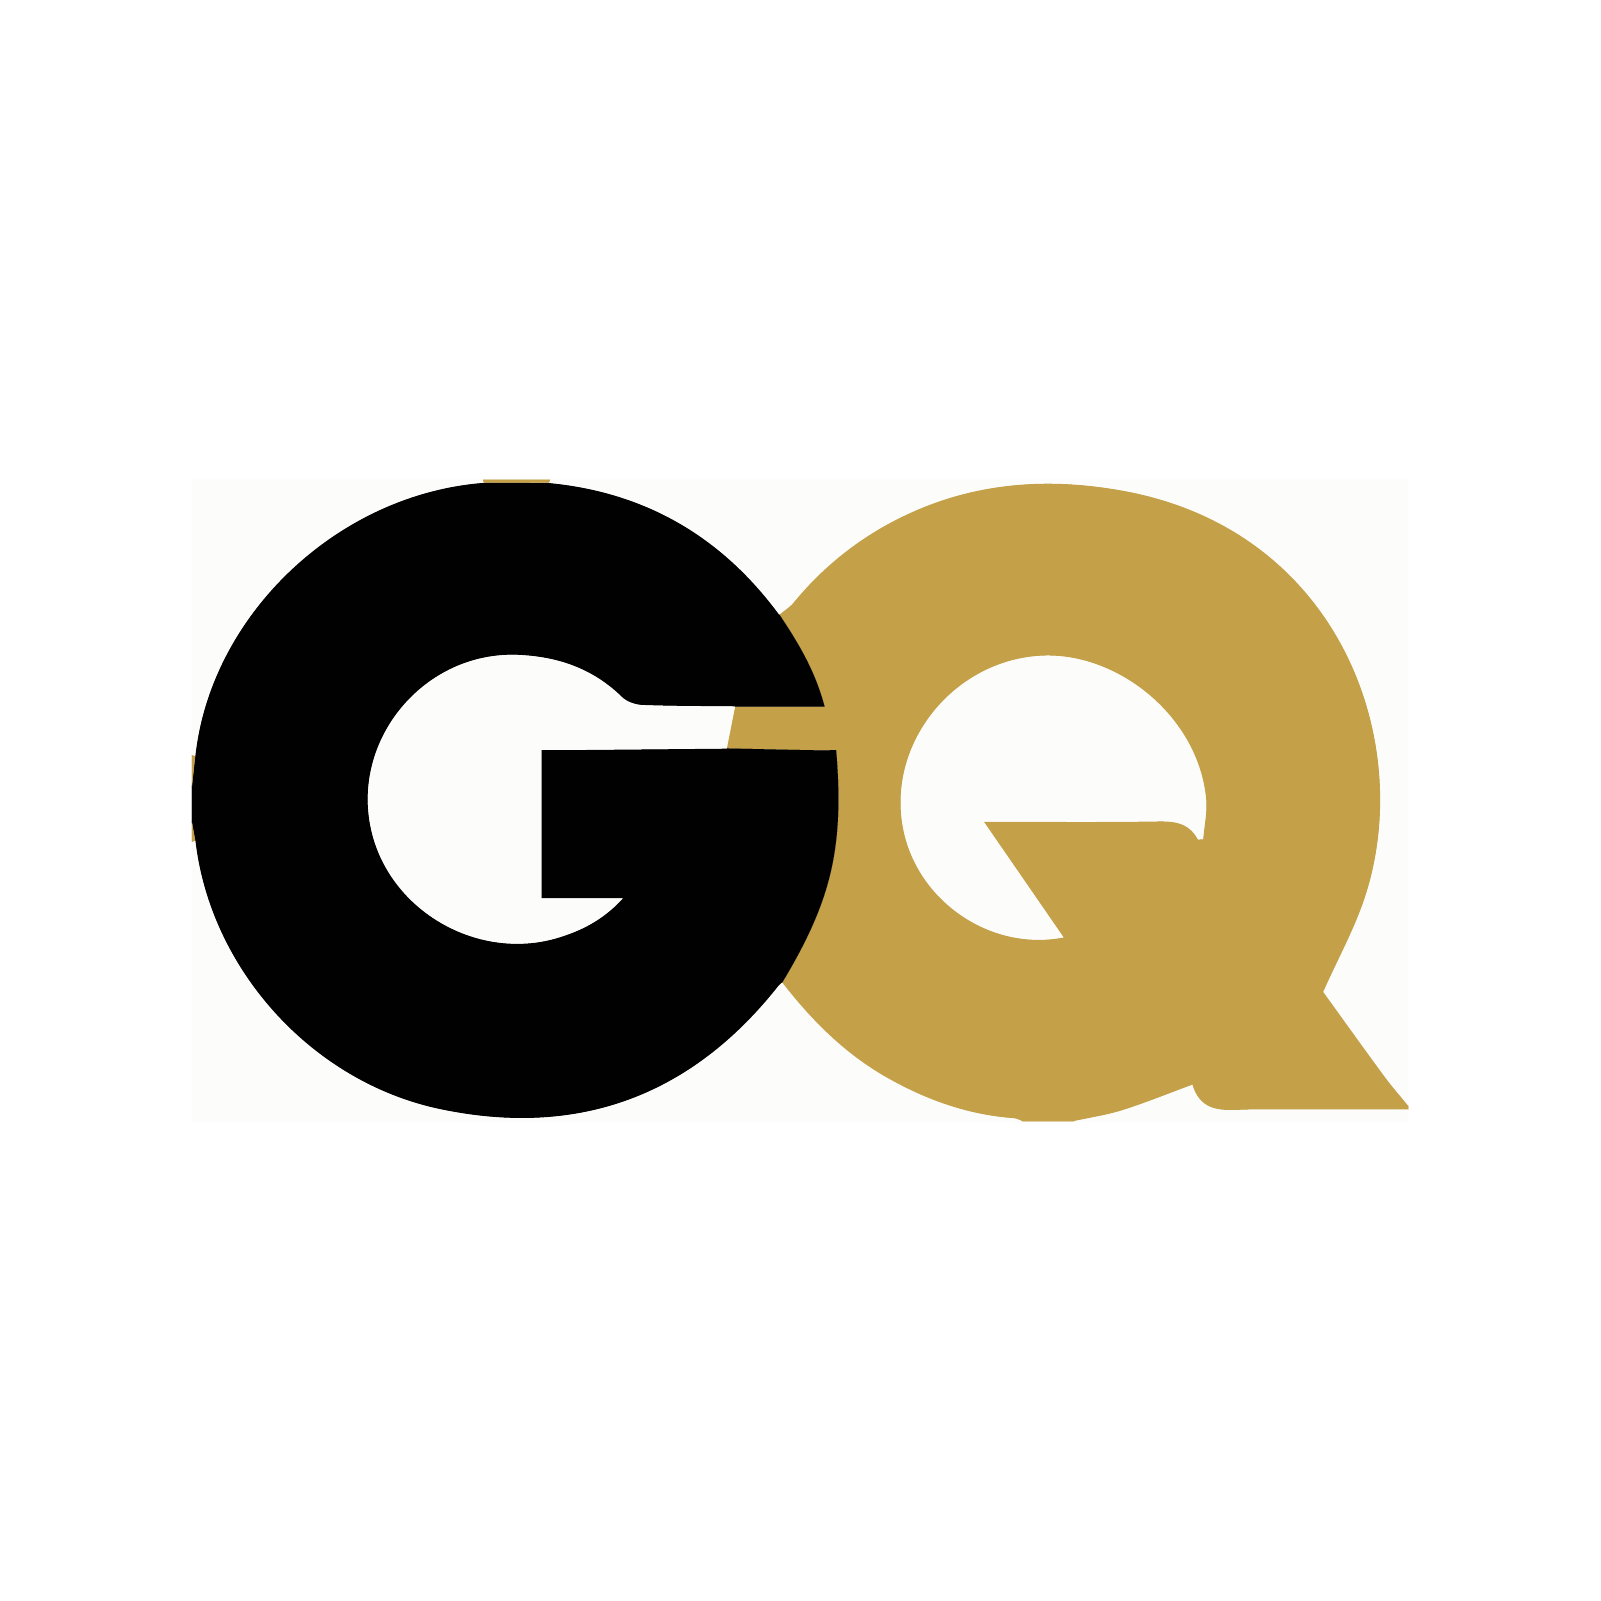 Press Logos_GQ.png